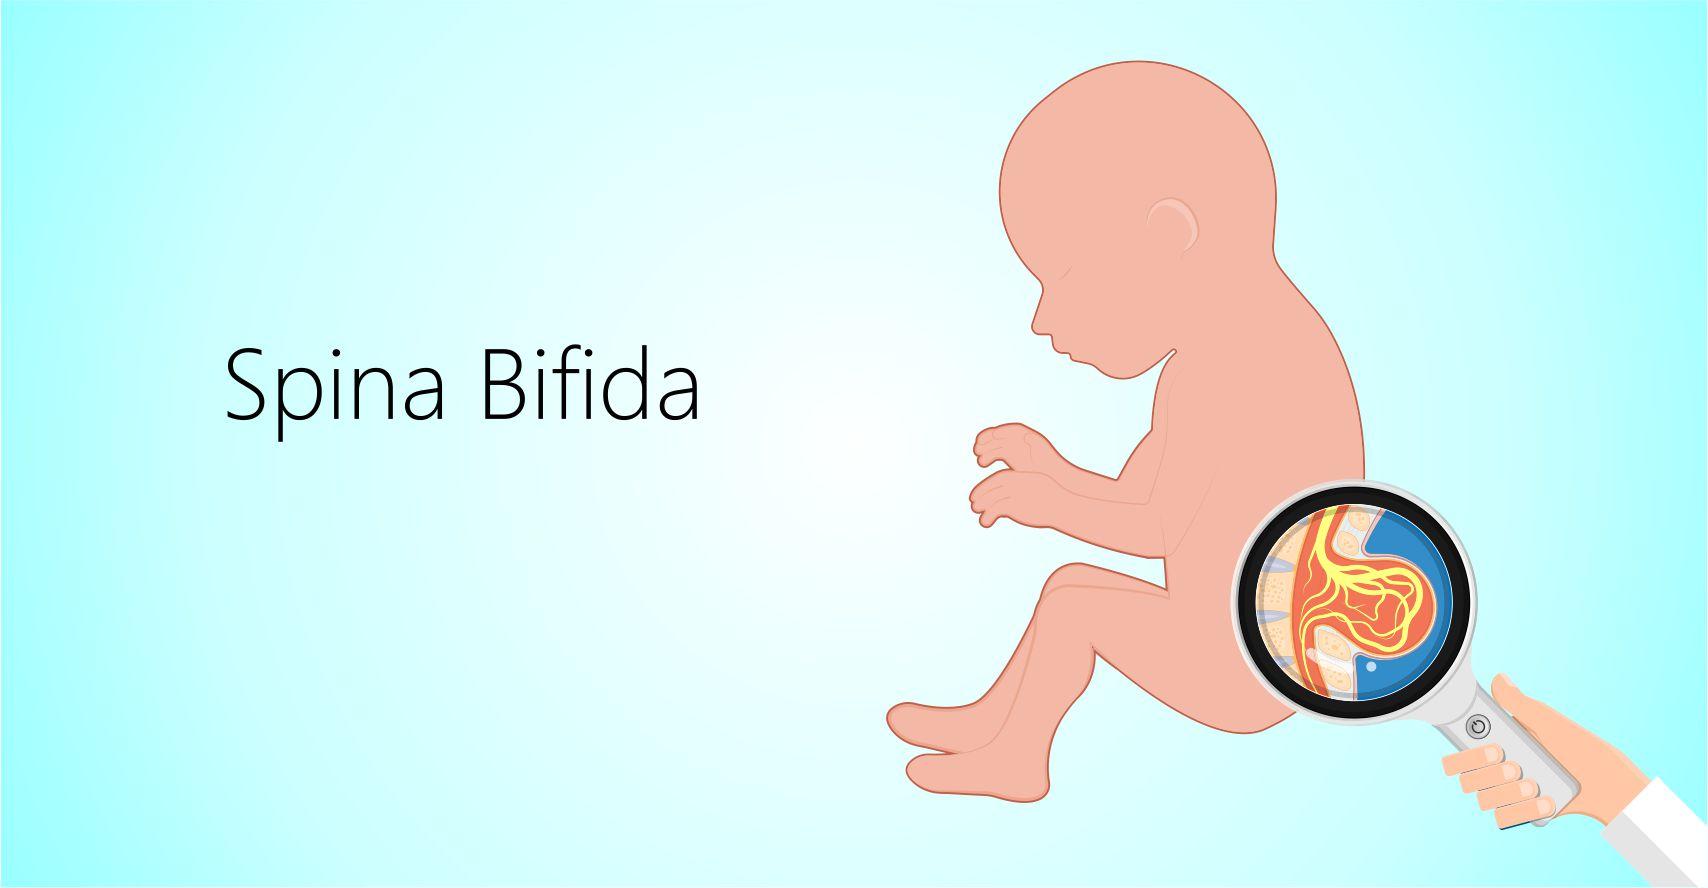 Diagnosis and treatment for Spina Bifida